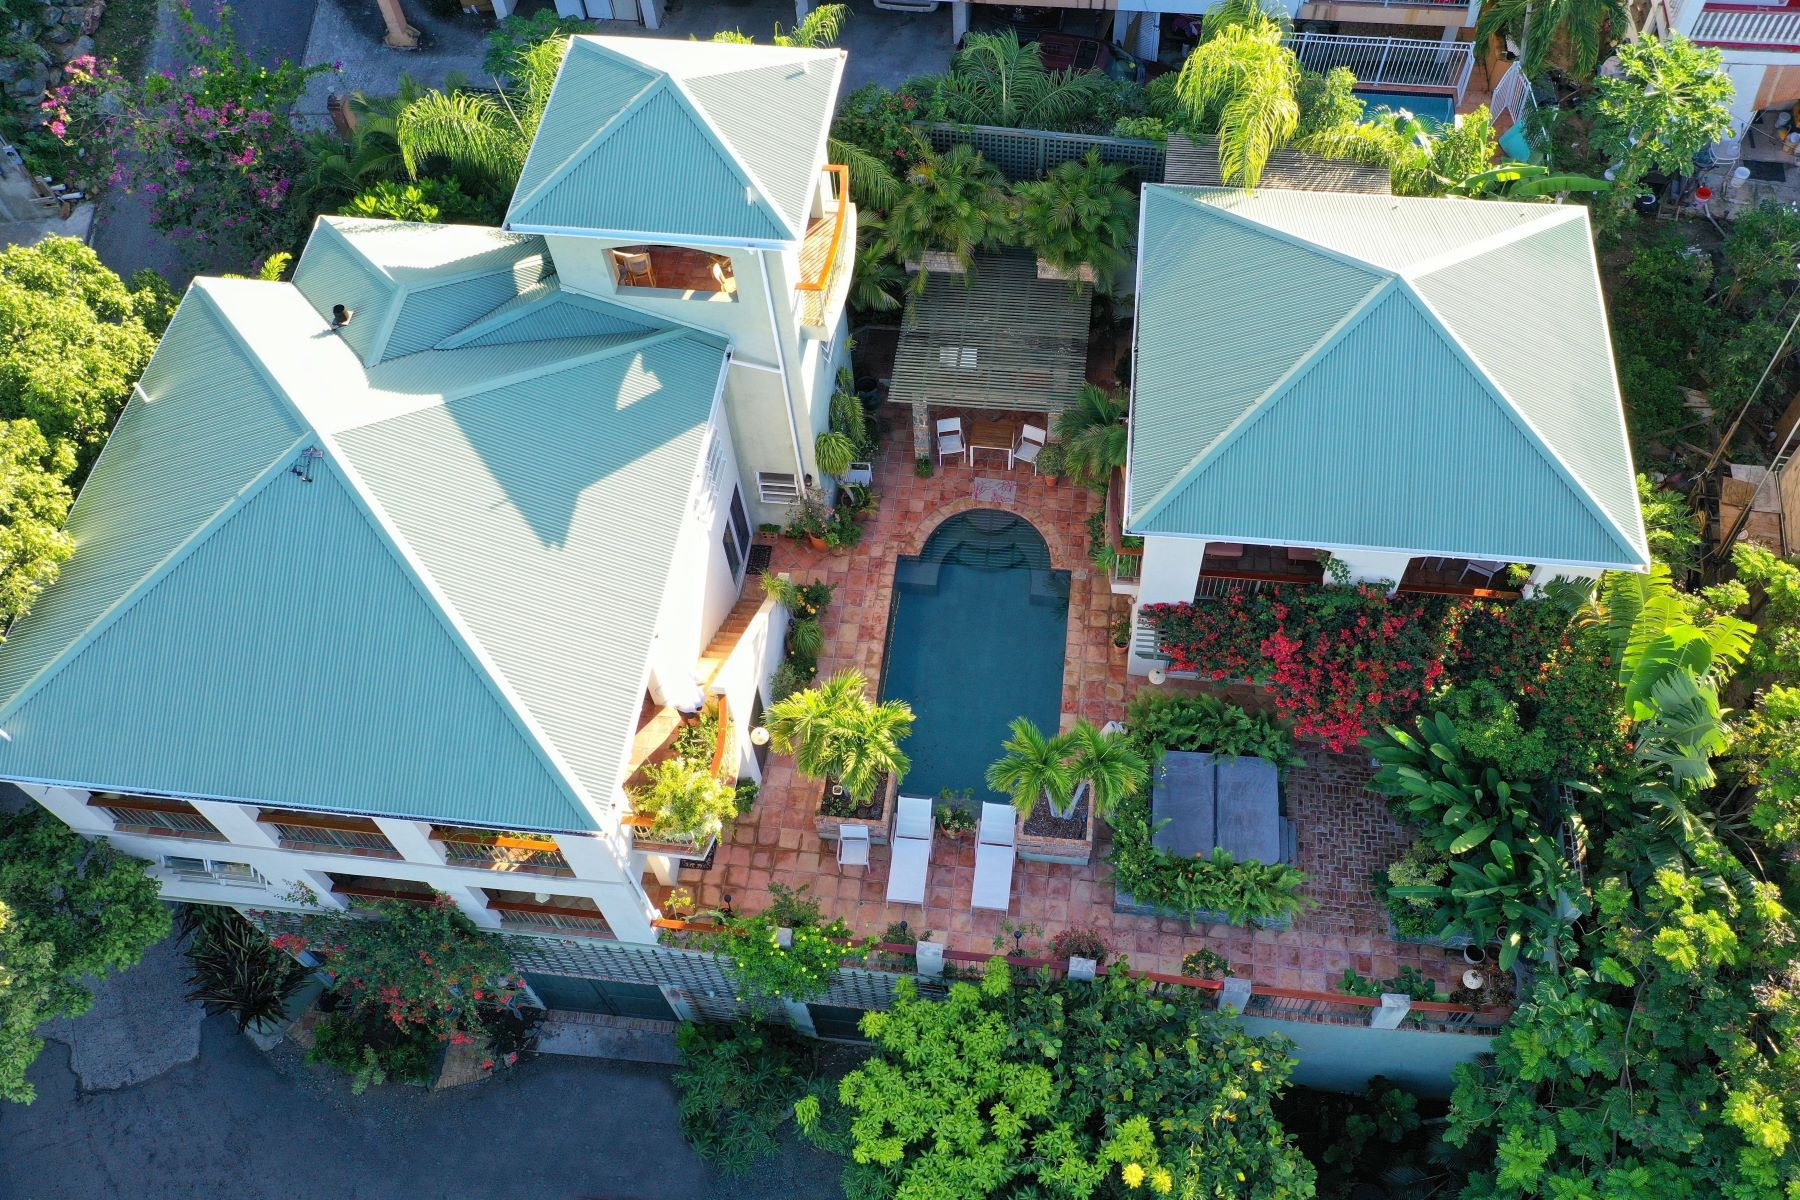 Single Family Homes für Verkauf beim El Capitan del Sol 201 Estate Contant & Enighed St John, Virgin Islands 00830 Amerikanische Jungferninseln